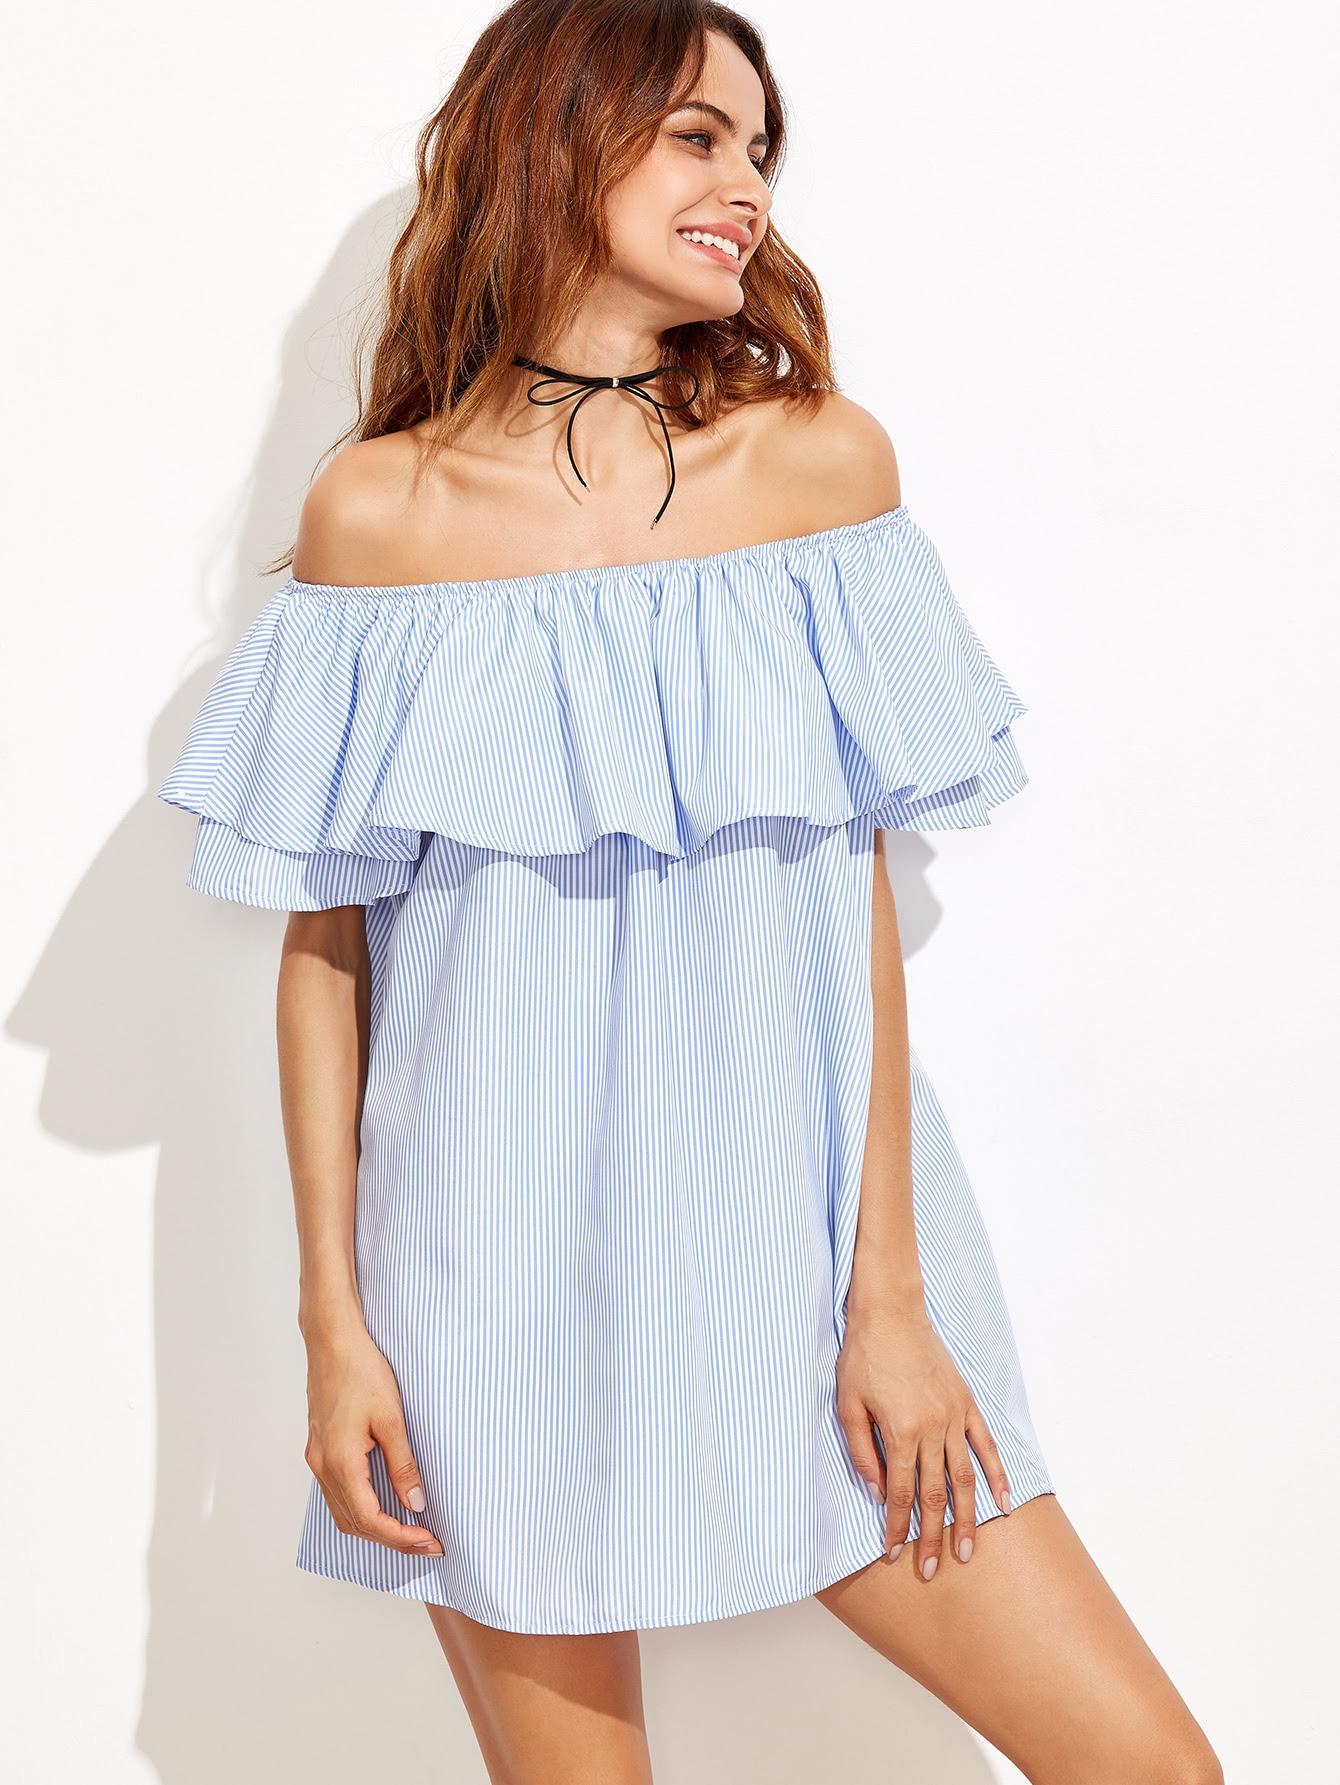 http://www.shein.com/Blue-Striped-Off-The-Shoulder-Ruffle-Dress-p-312001-cat-1727.html?aff_id=8630